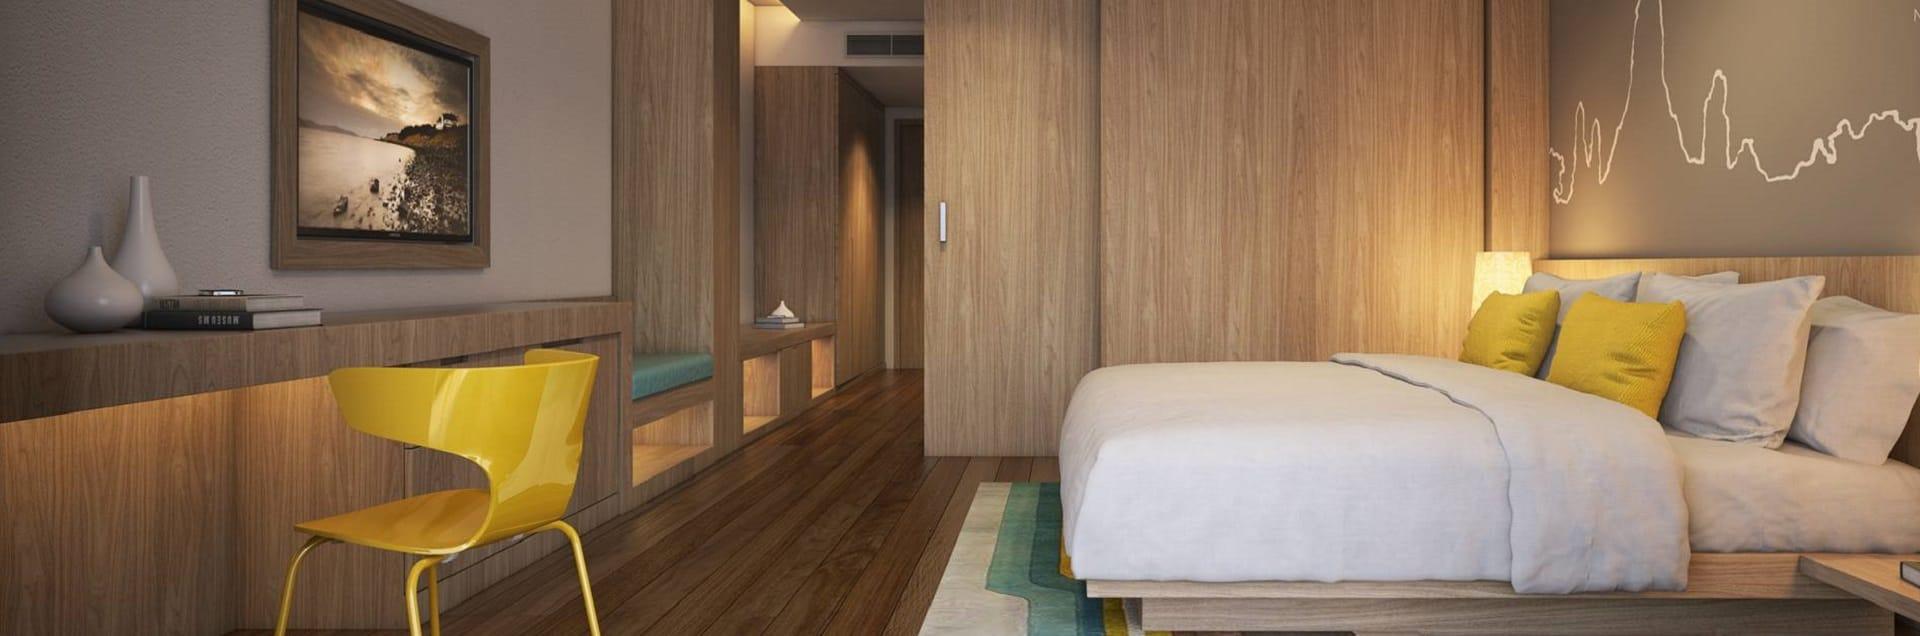 movenpick-resort-spa-karon-beach-hotel-renovation-design-thailand-architecture-sohohospitality